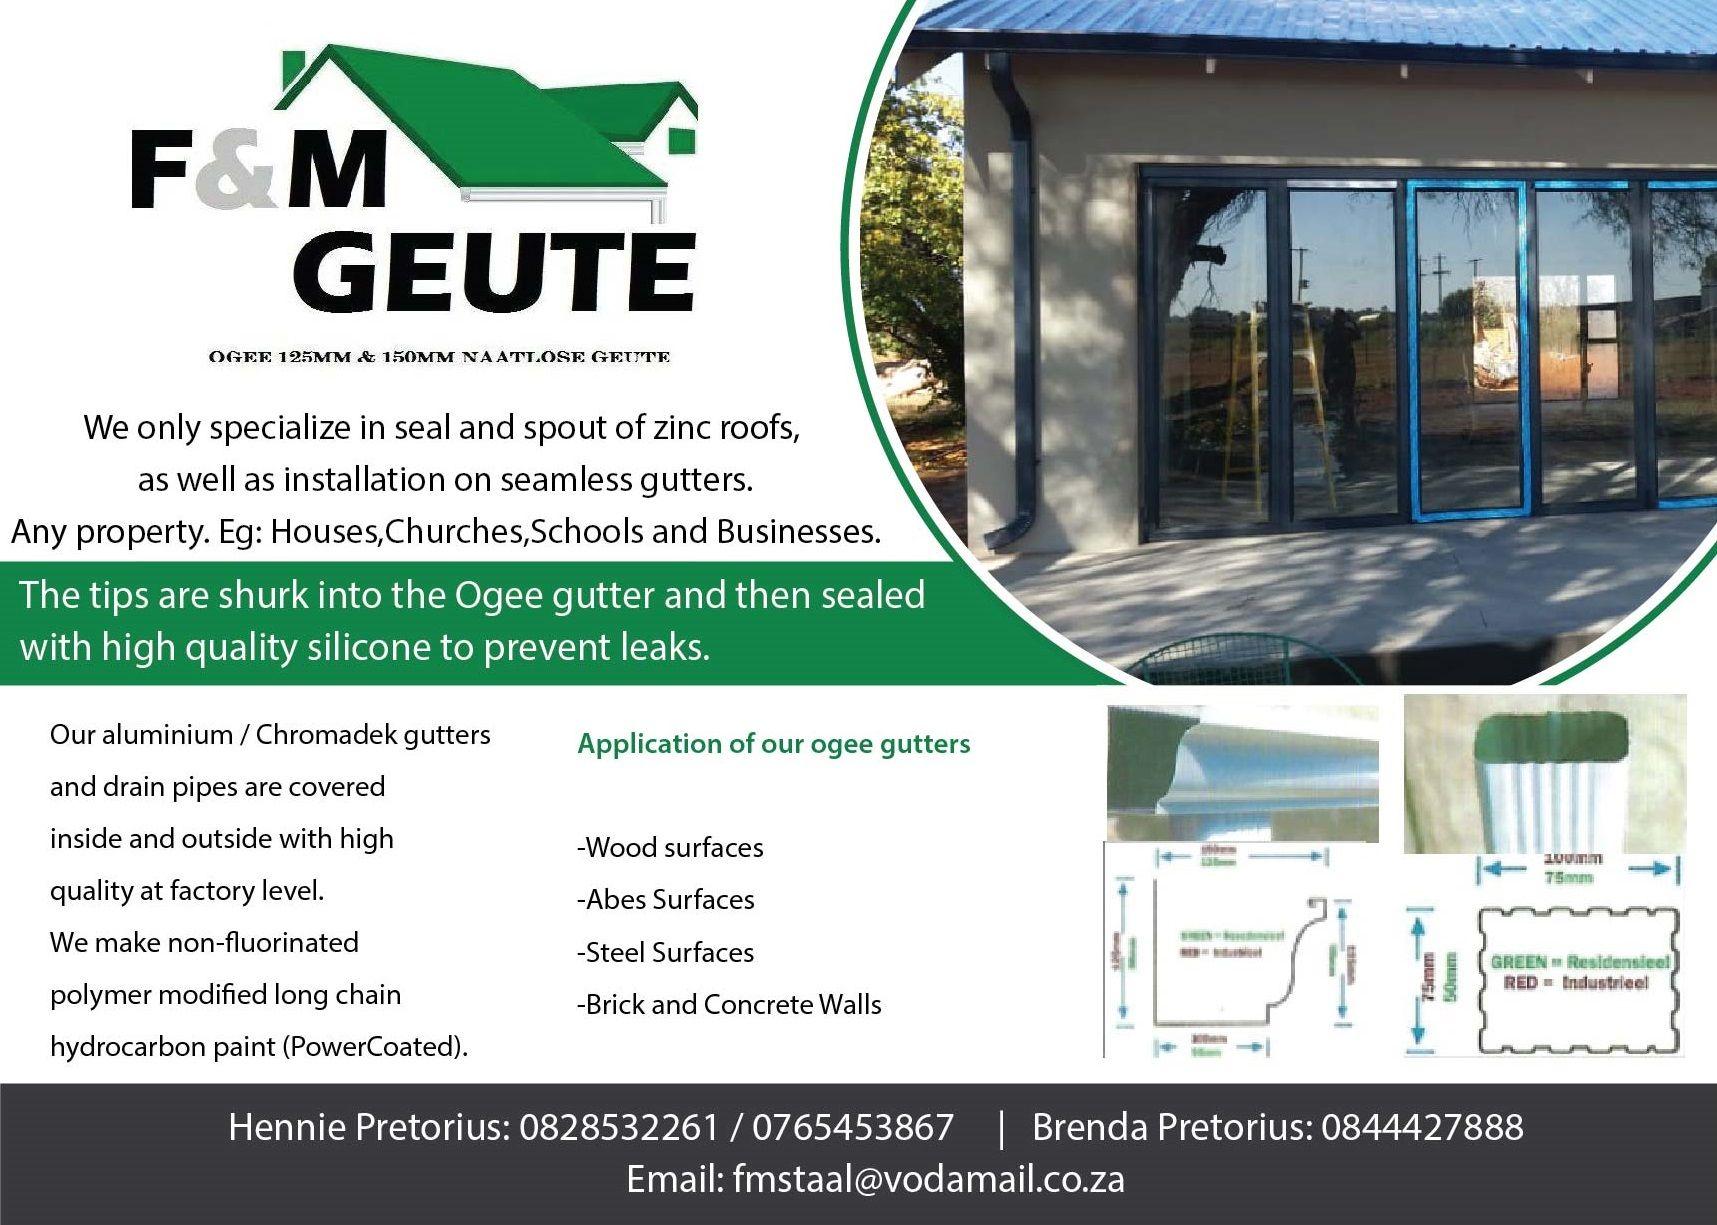 F M Geute Freestate Hennie Pretorius 082 853 2261 076 5453867 Brenda Pretorius 084 442 7888 Email Fmstaal Vodamail C Seamless Gutters Zinc Roof Gutters